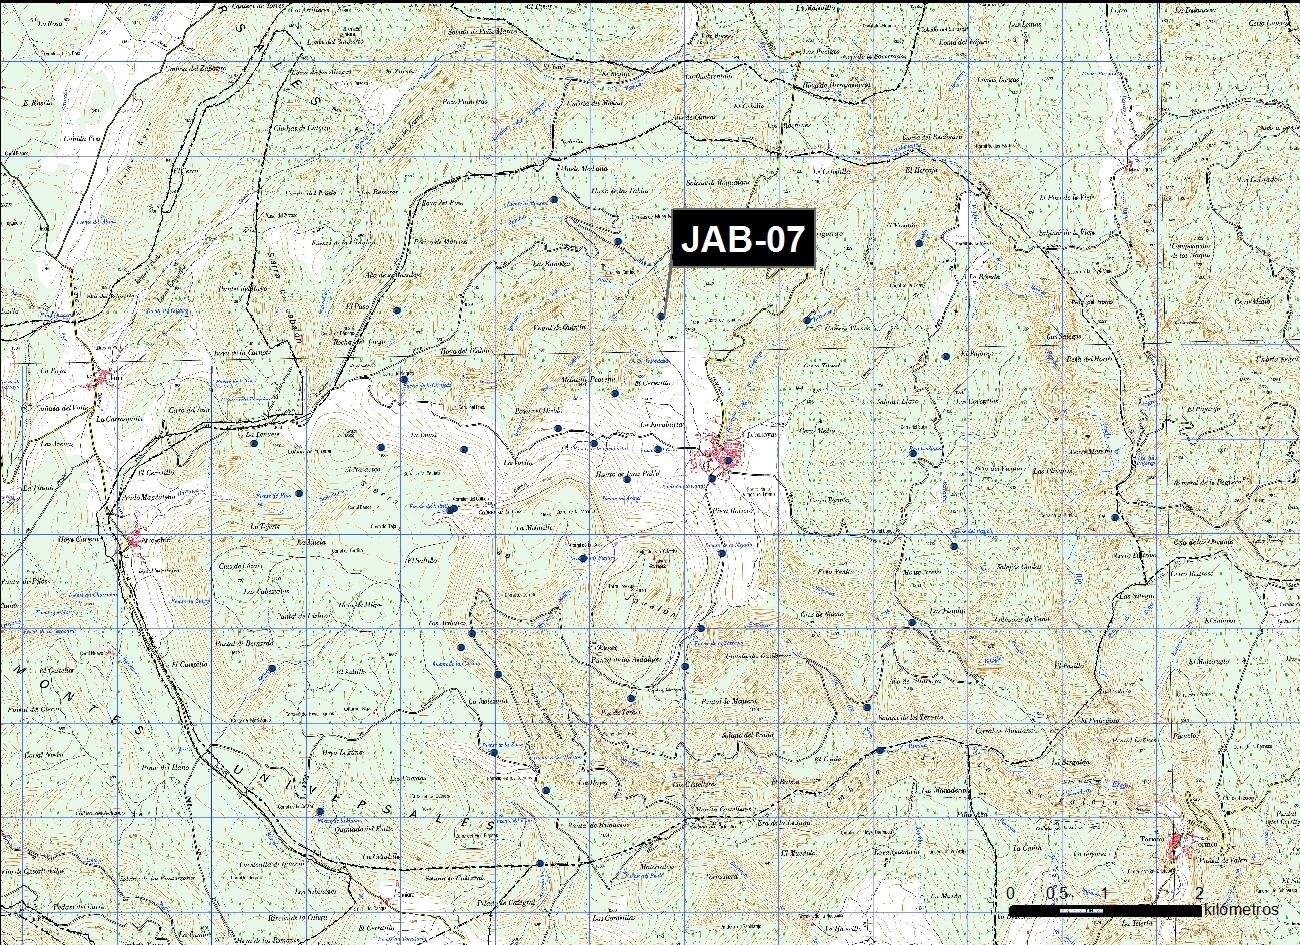 JAB_07_M.V.LOZANO_ENJORDANA_MAP.TOPO 1